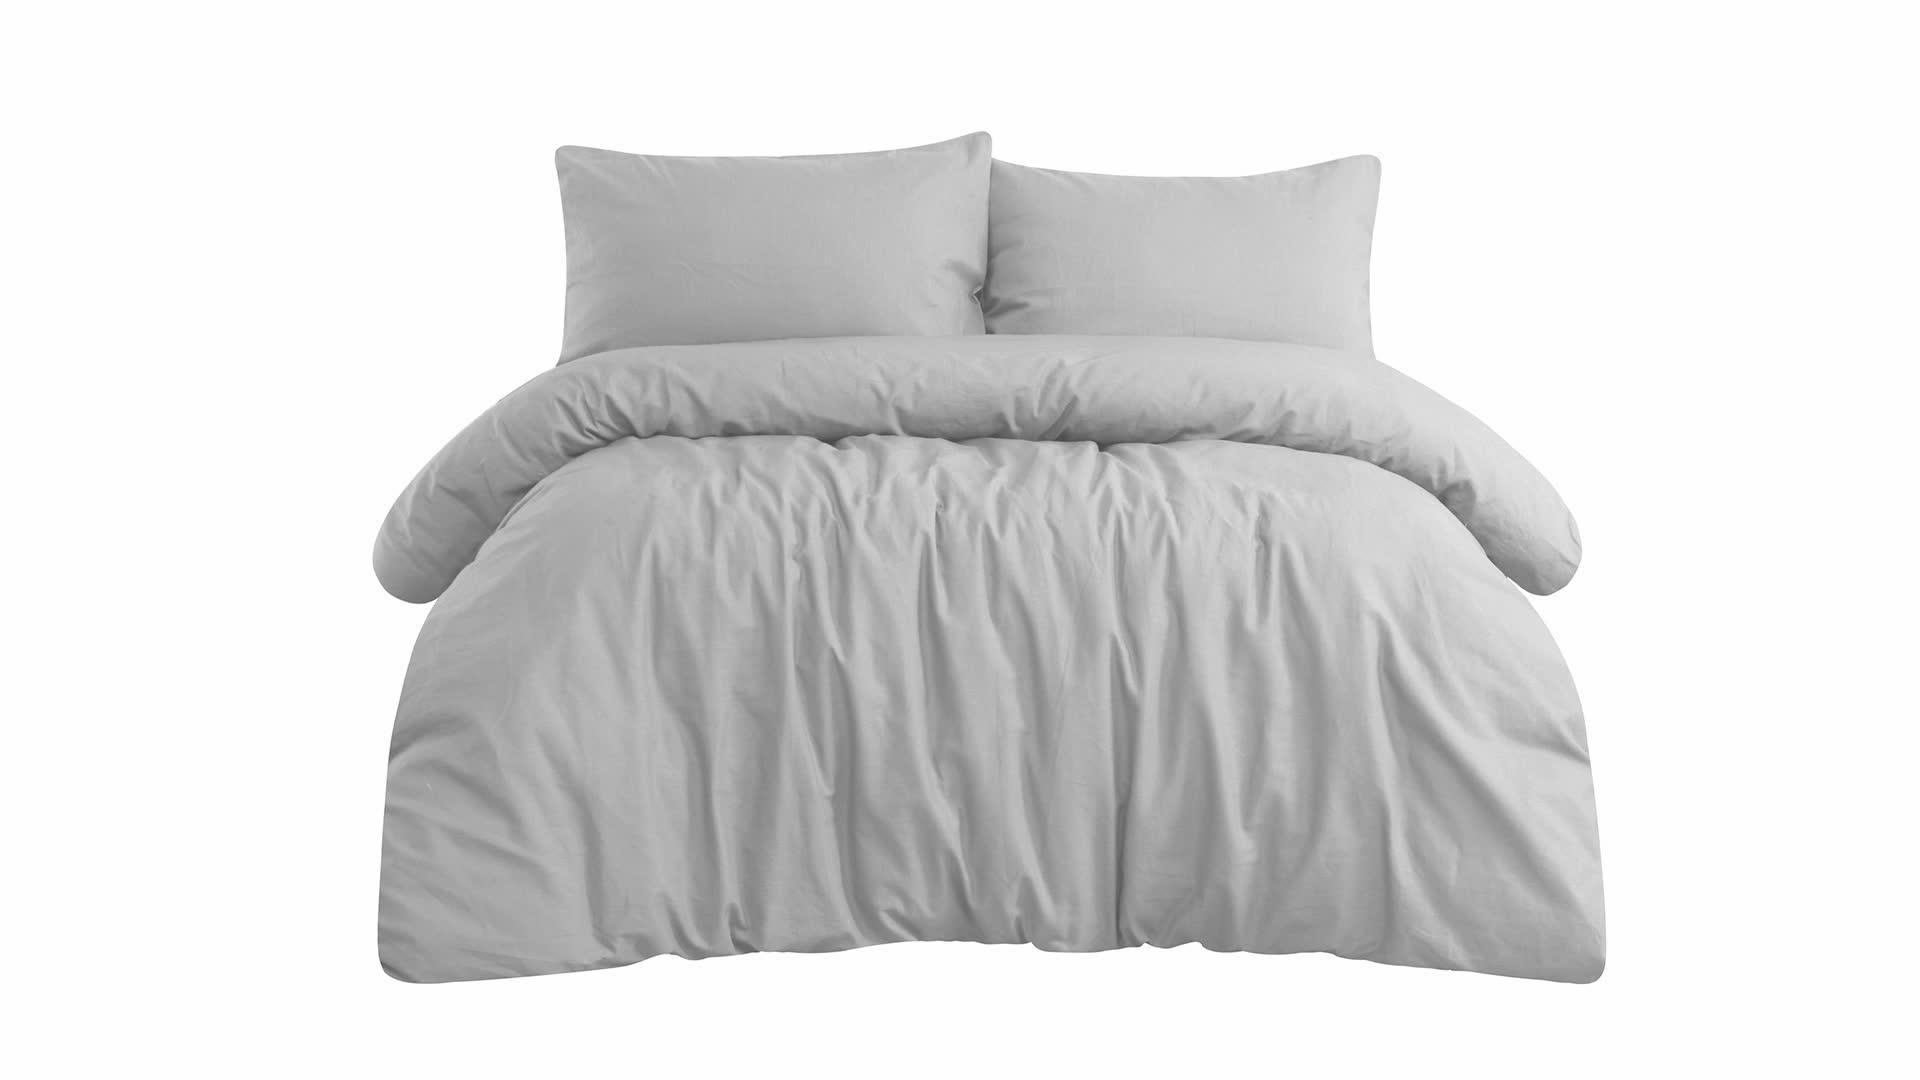 Korean Style Famous Brands Light Gray Linen Cotton Quilt Duvet Cover Bedding Set with Pillowcases